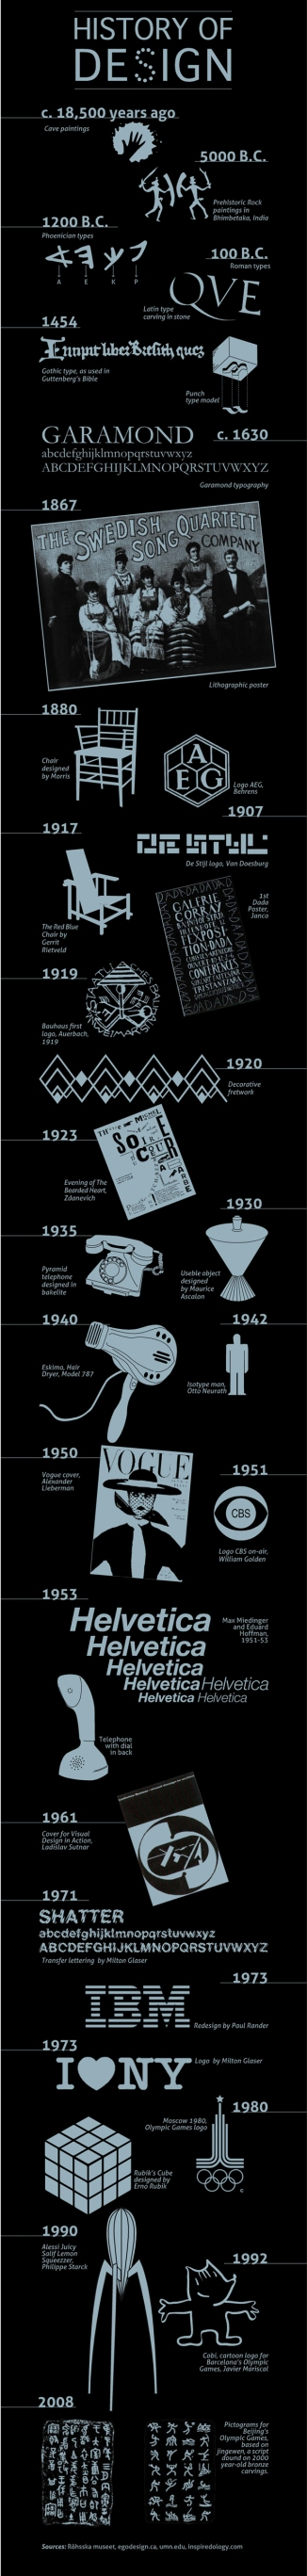 Fonte: http://www.businessinsider.com/the-history-of-design-2011-3